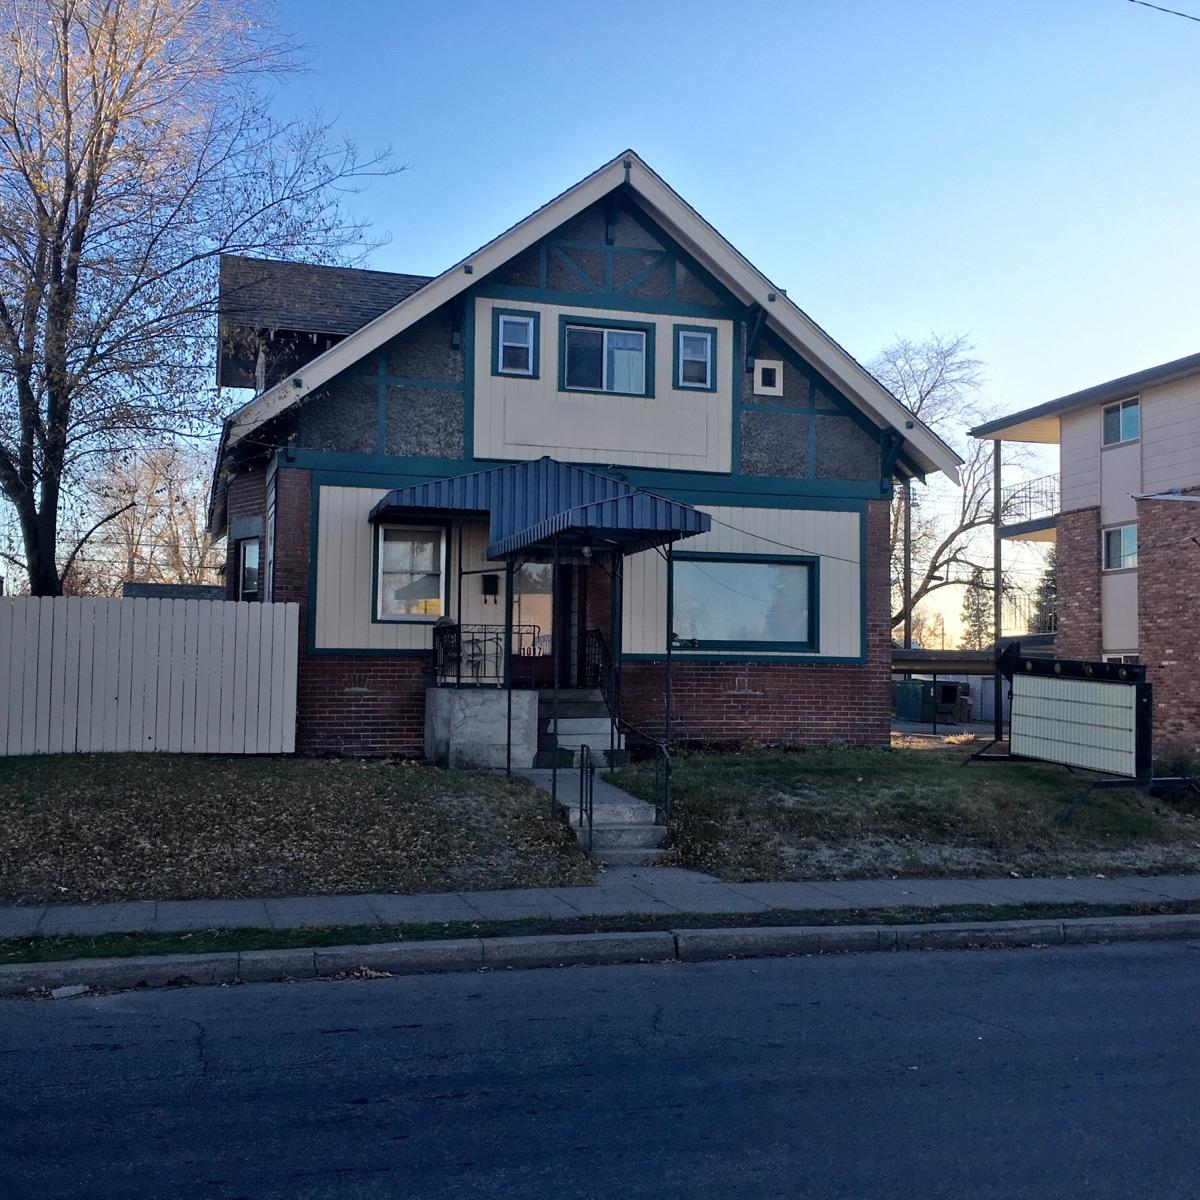 Duplex in North Spokane      Sale: $148,850